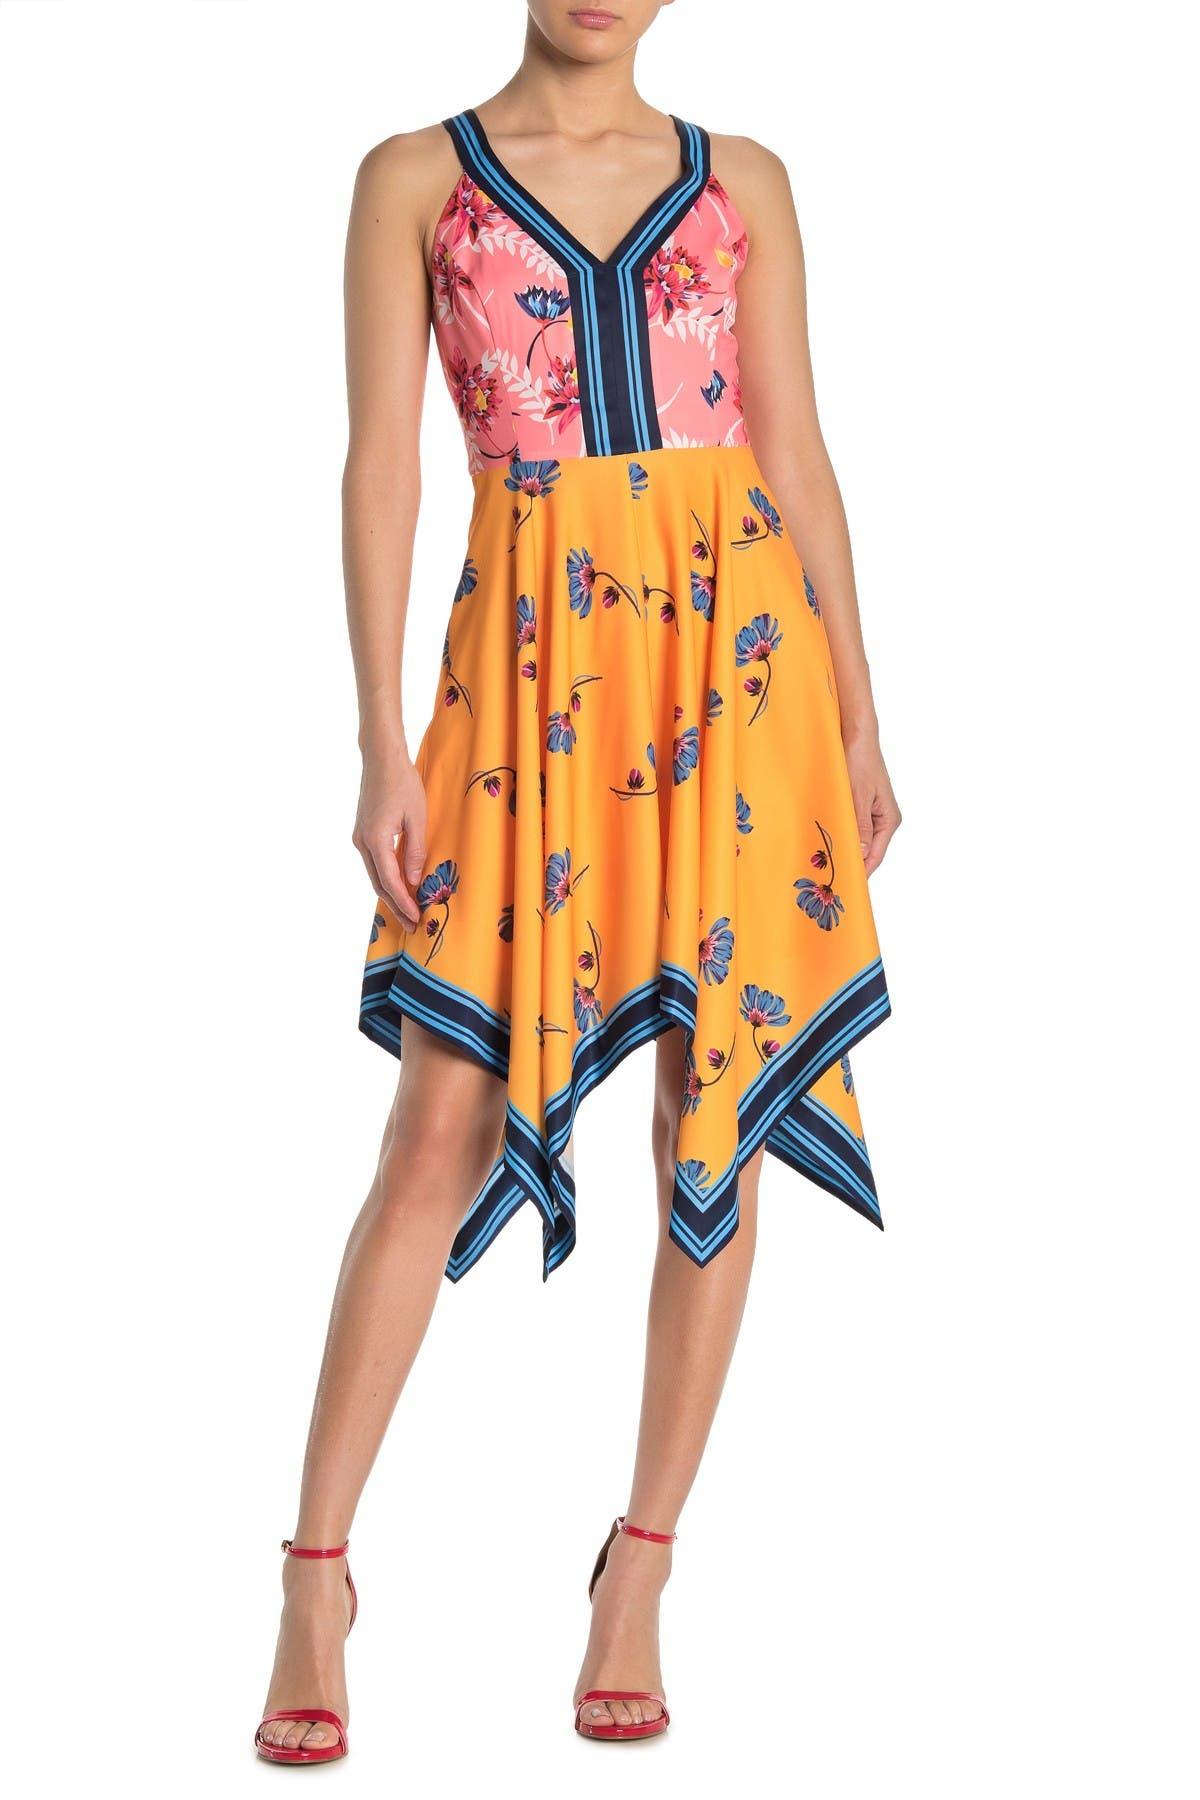 Image of GUESS Floral Colorblock Handkerchief Hem Dress